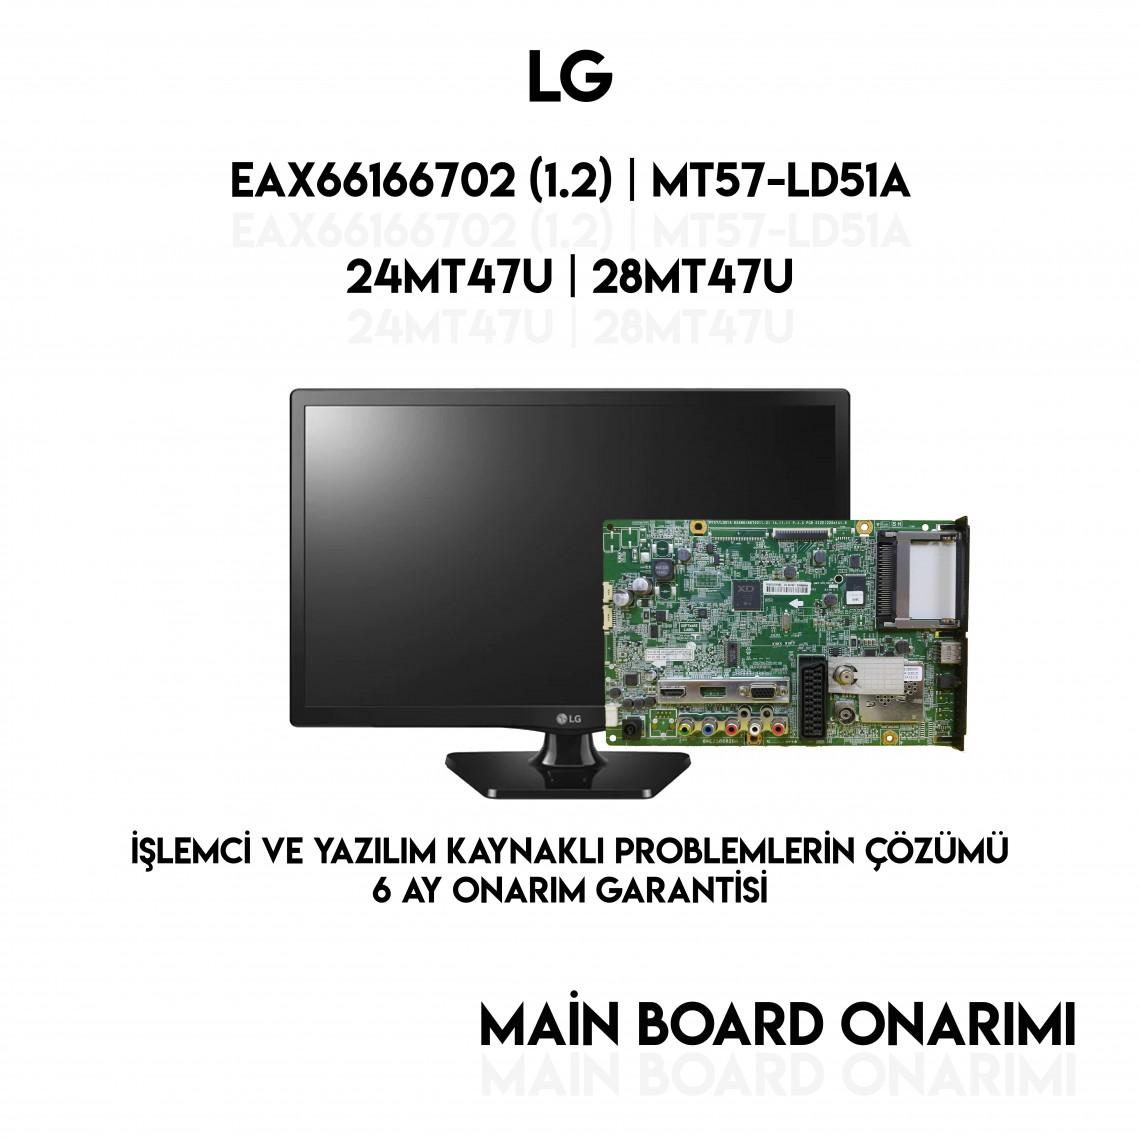 EBU63123606, EAX66166702 (1.2), EBT63673525, MT57/LD51A, LG 24MT47U-PZ, MAIN BOARD, ANA KART